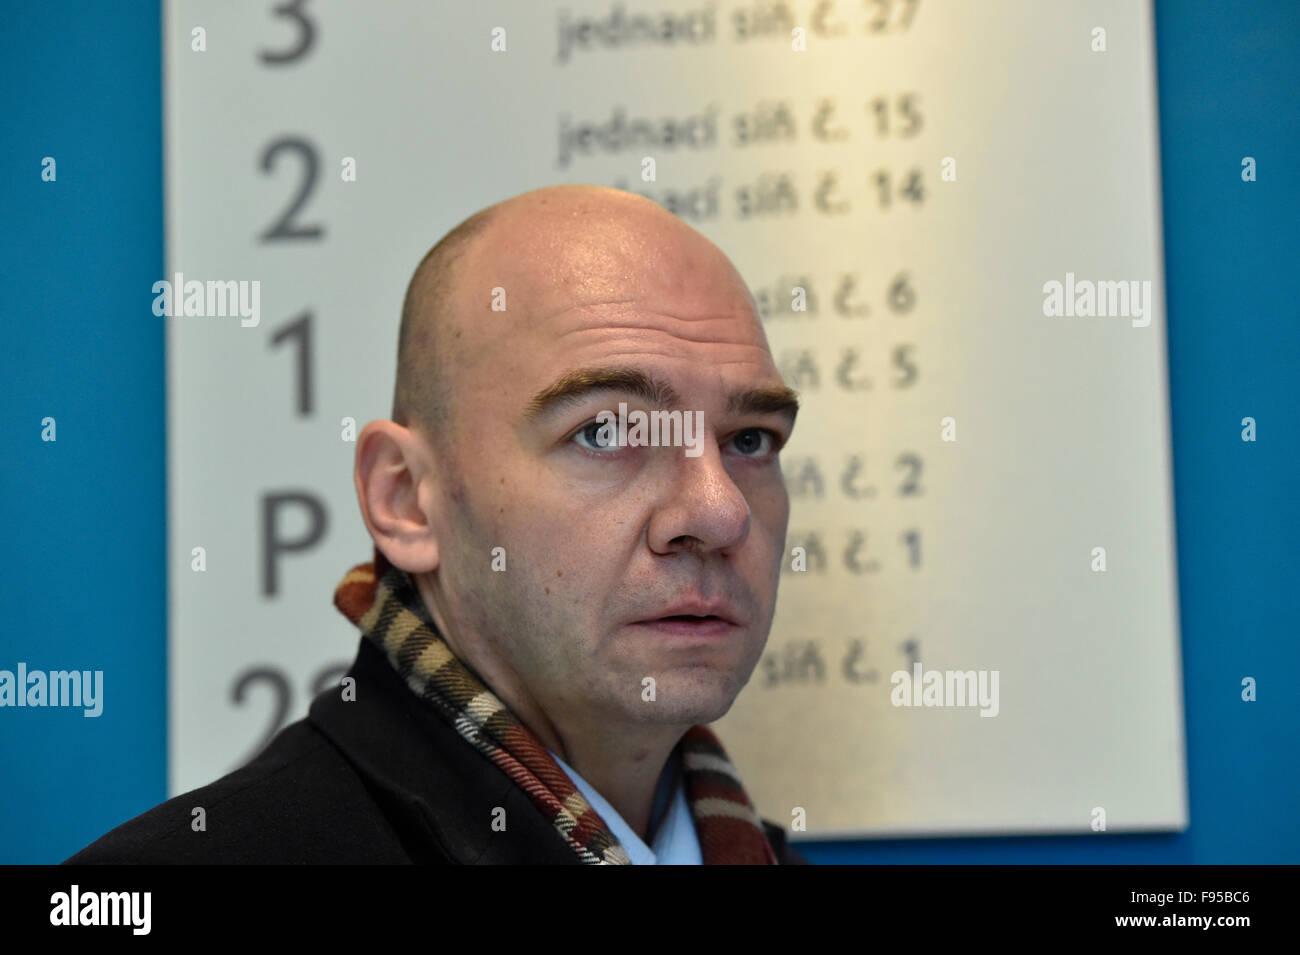 Brno, Czech Republic. 14th Dec, 2015. The Municipal Court in Brno extended the pre-trial custody of U.S. citizen - Stock Image